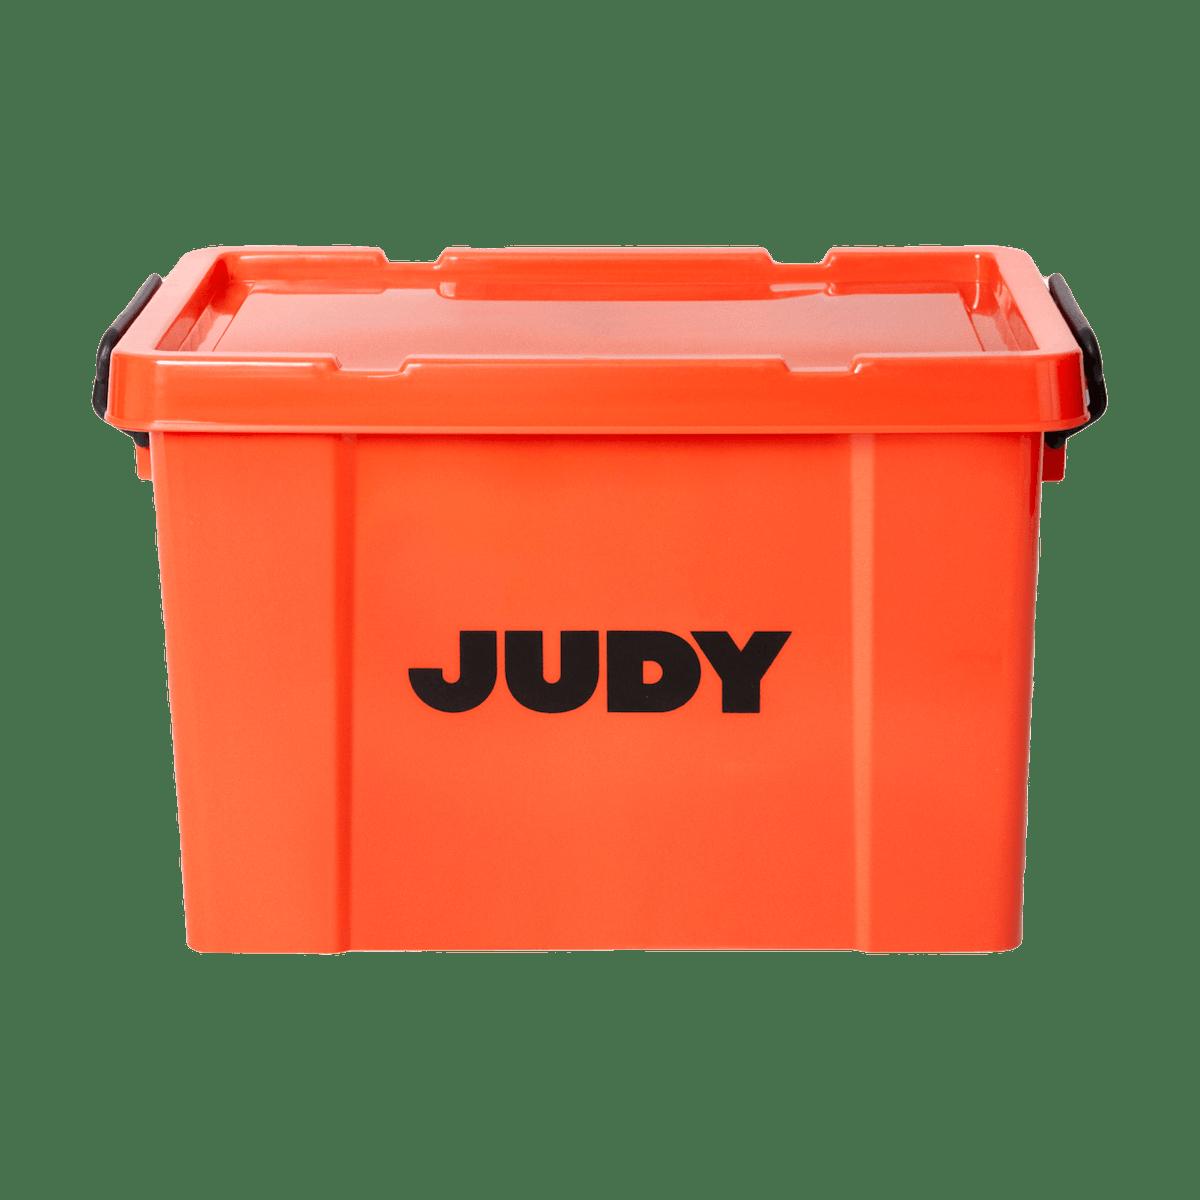 The Safe Emergency Kit